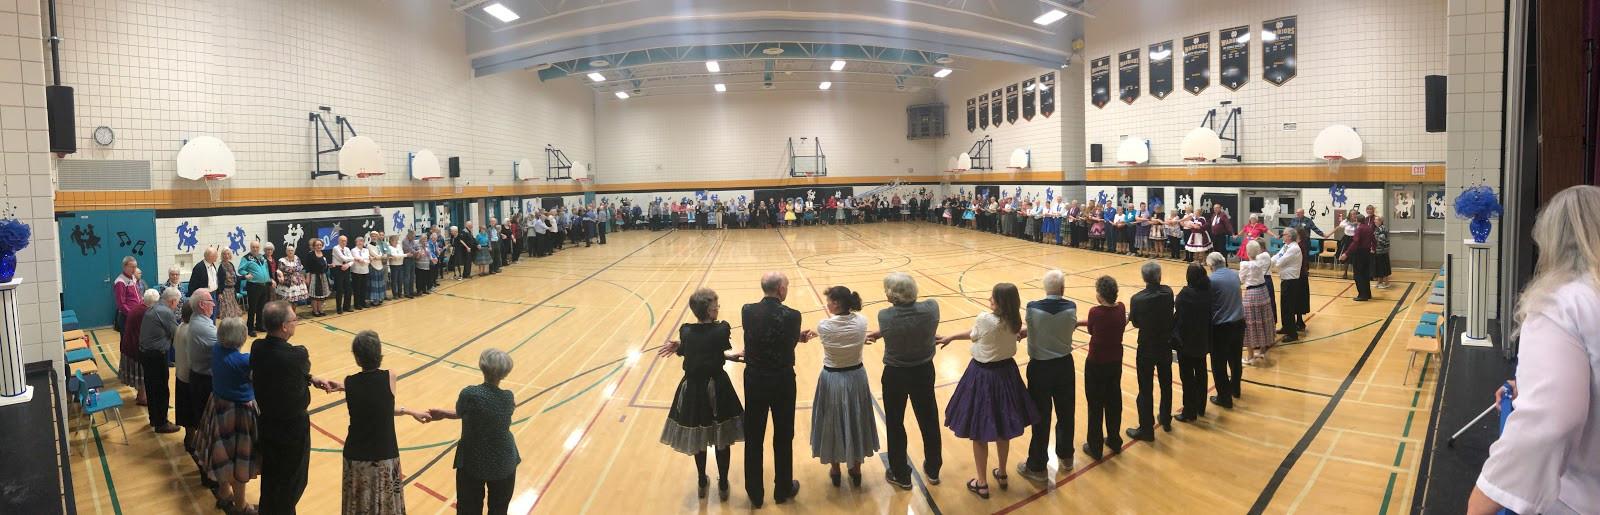 Half way dance 13.jpg